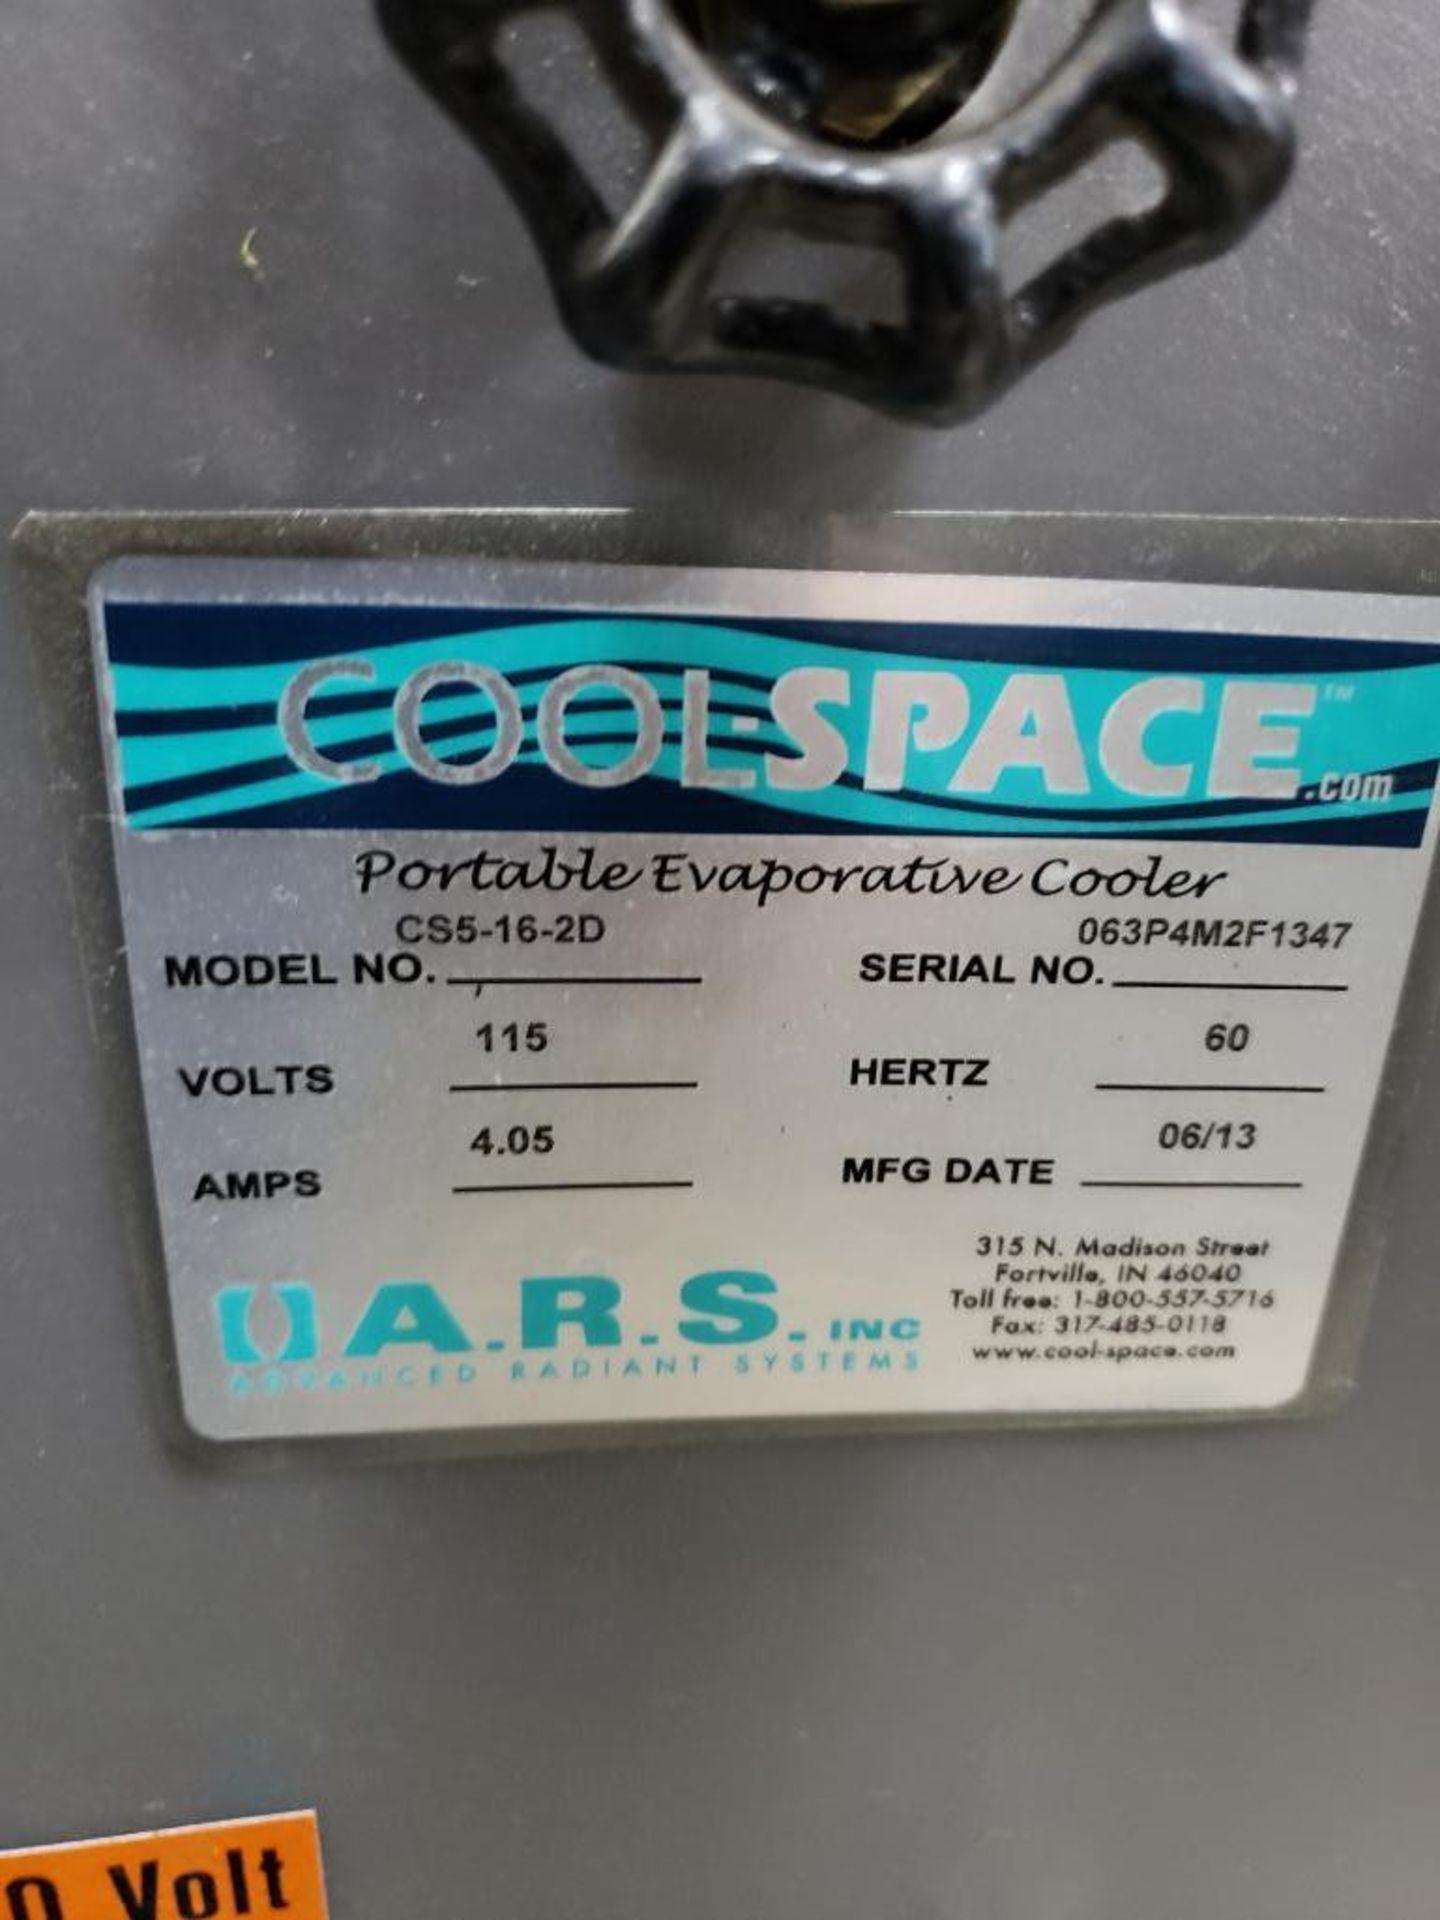 Lot 76 - Cool space portable evaporative cooler model CS5-16-2D. single phase 115v. Mfg Date 06/13.